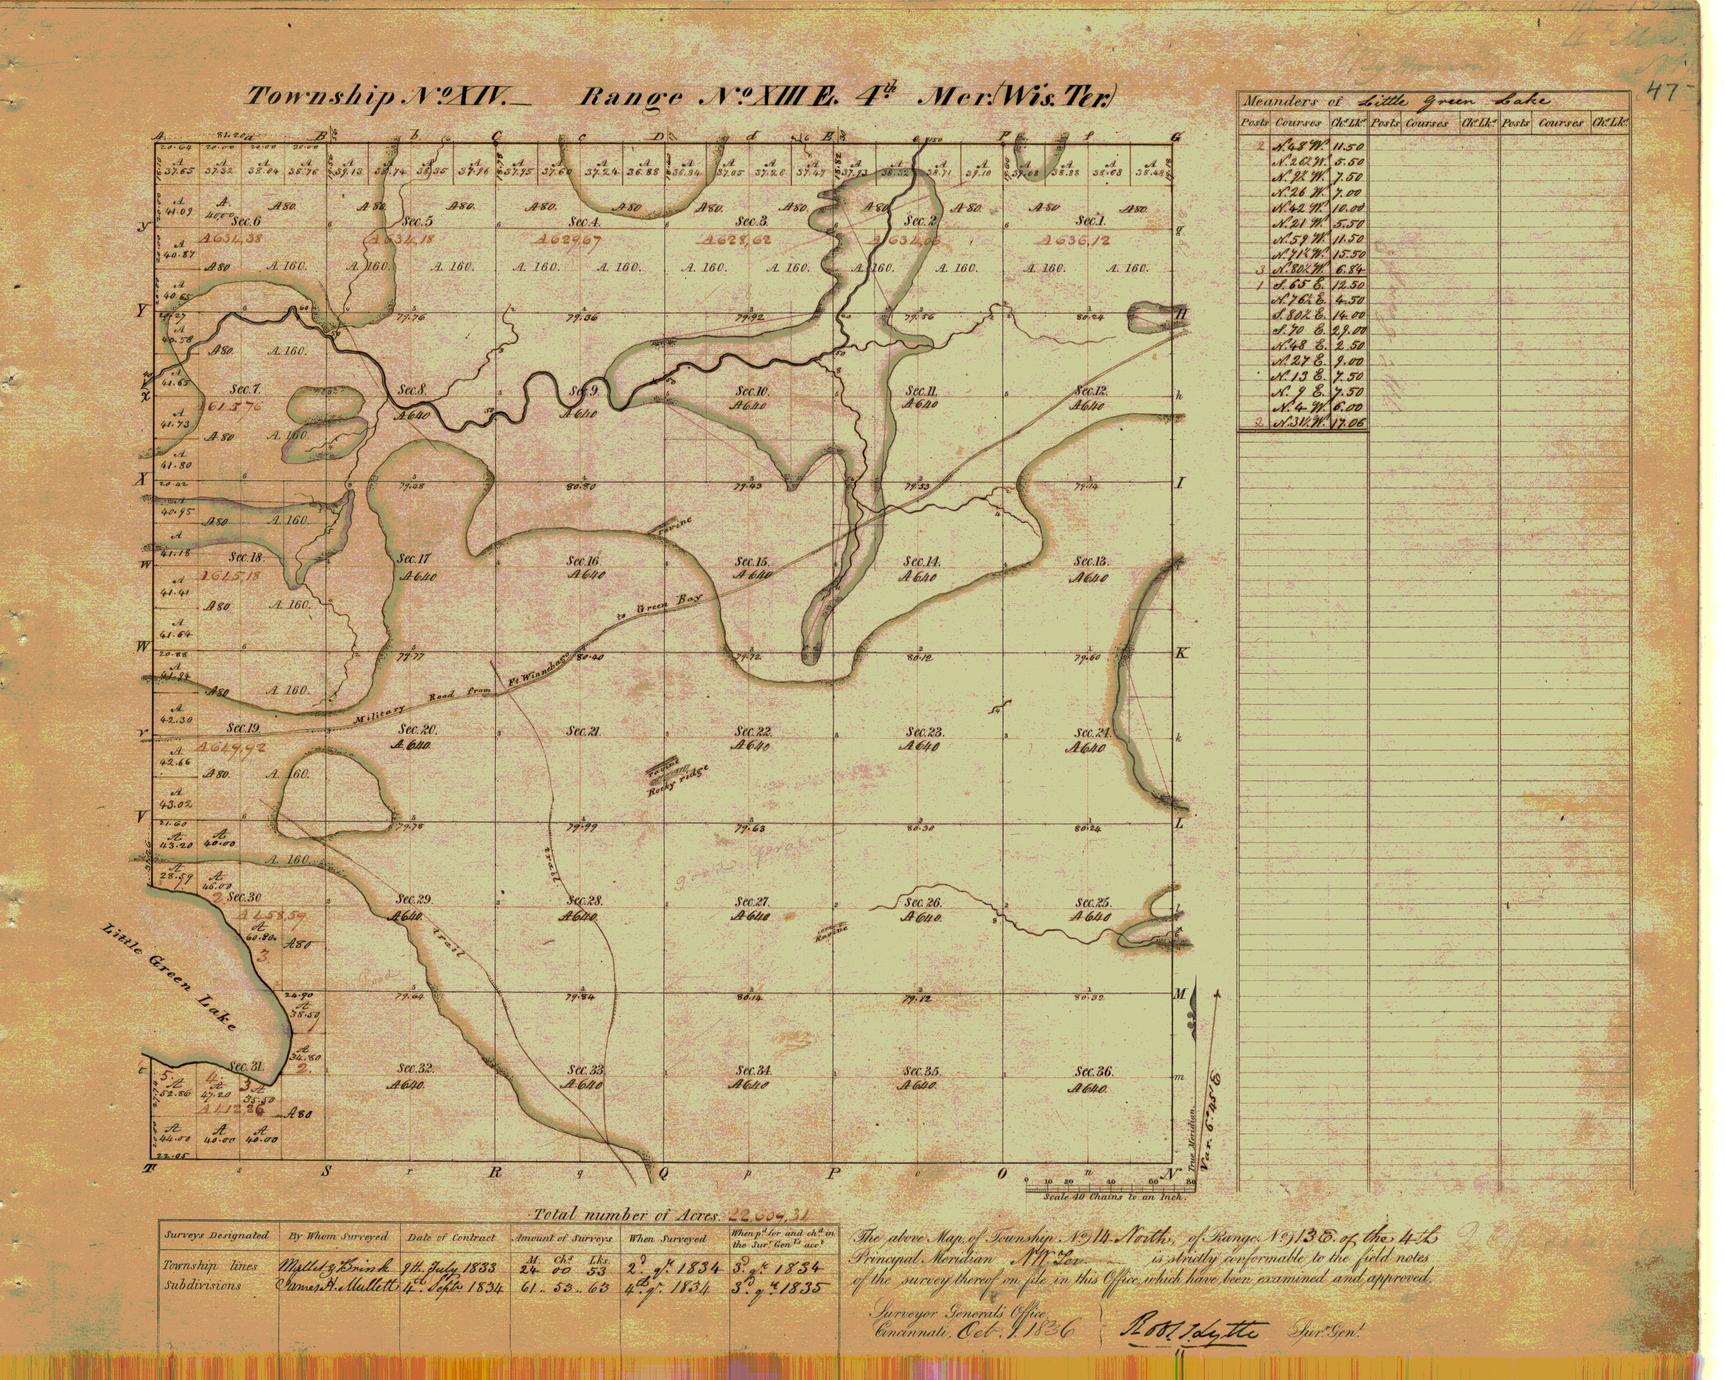 [Public Land Survey System map: Wisconsin Township 14 North, Range 13 East]